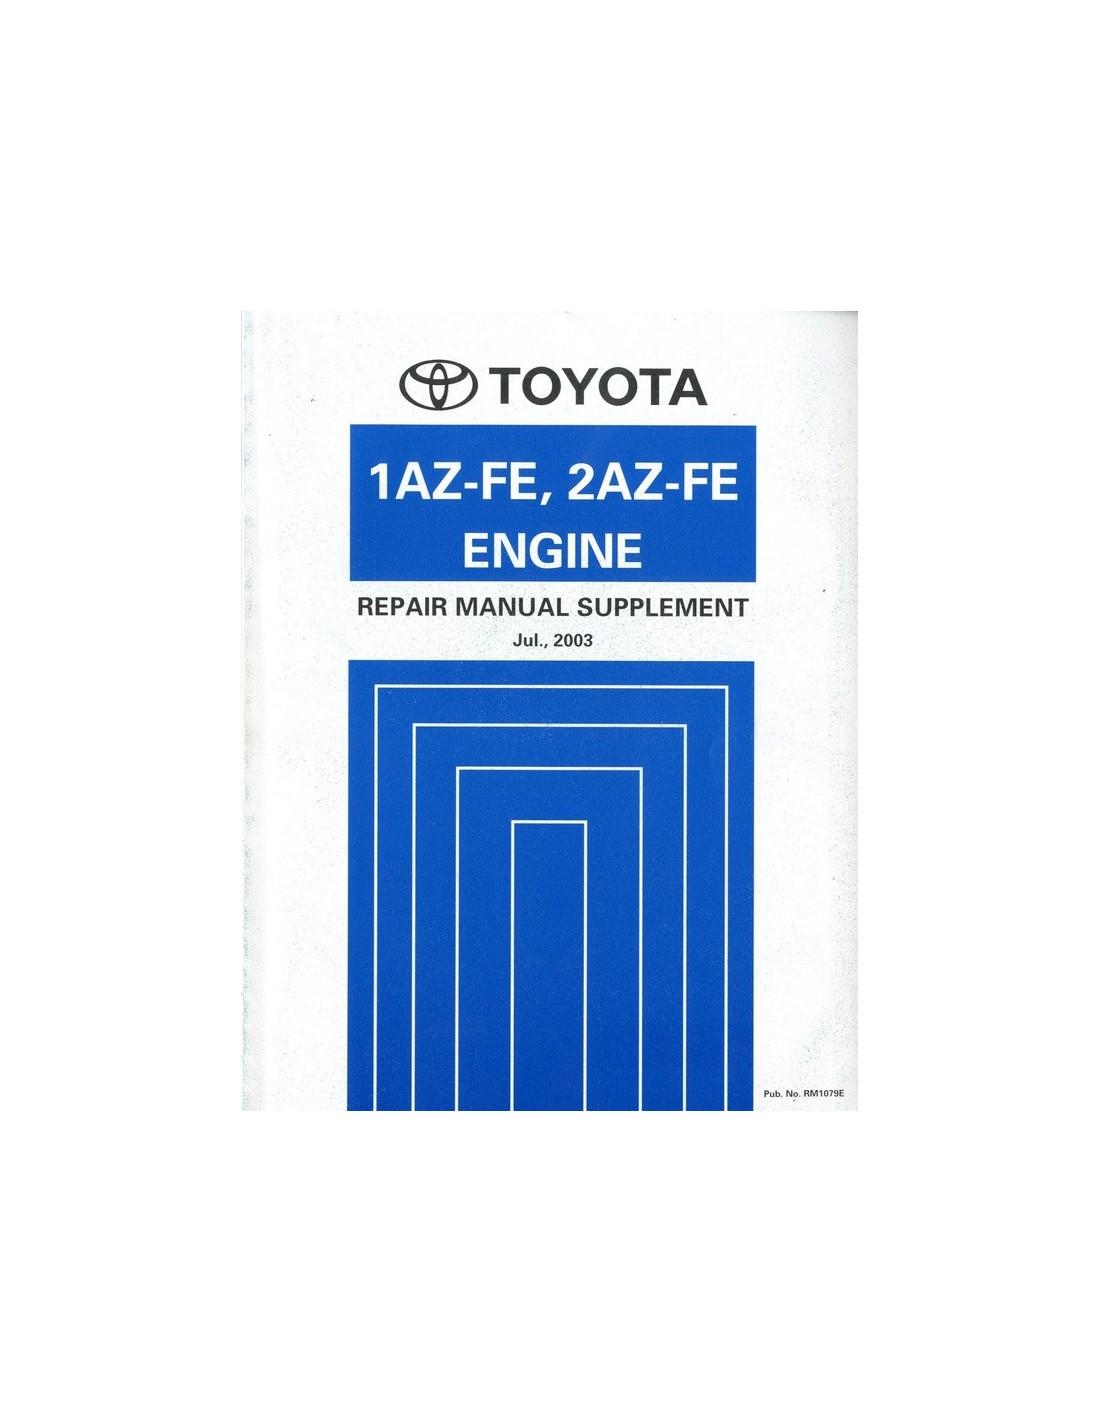 2003 toyota rav4 1az fe 2az fe engine repair manual 2003 toyota rav4 repair manual free download 2003 toyota rav4 service manual pdf